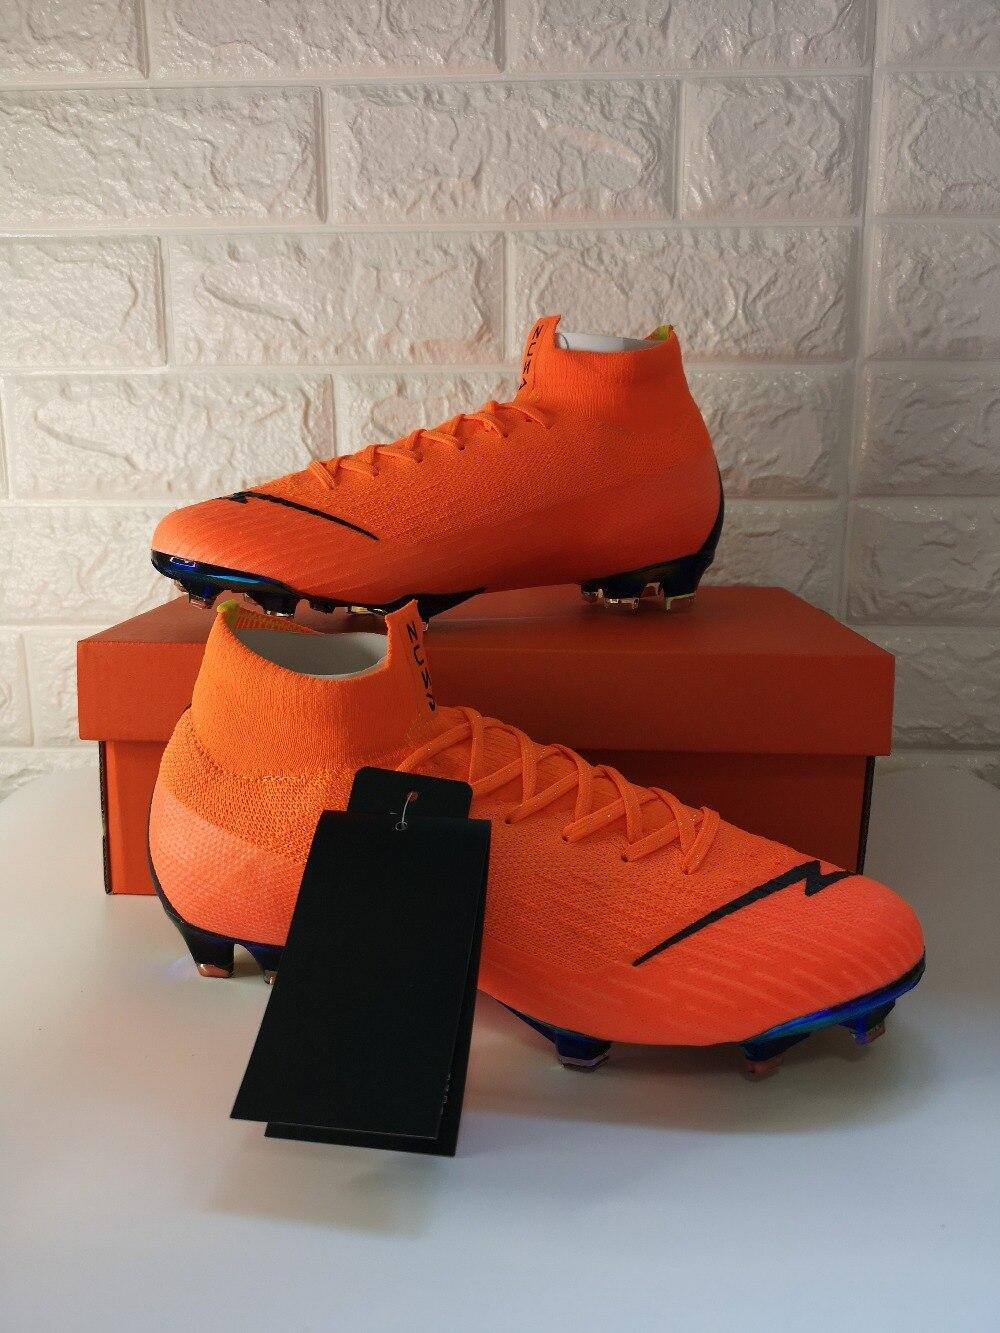 Hommes d'achat Pas Cher ZUSA Superfly VI Elite 360 FG Chaussures de Football En Plein Air Total Orange chaussures de Football Ventes